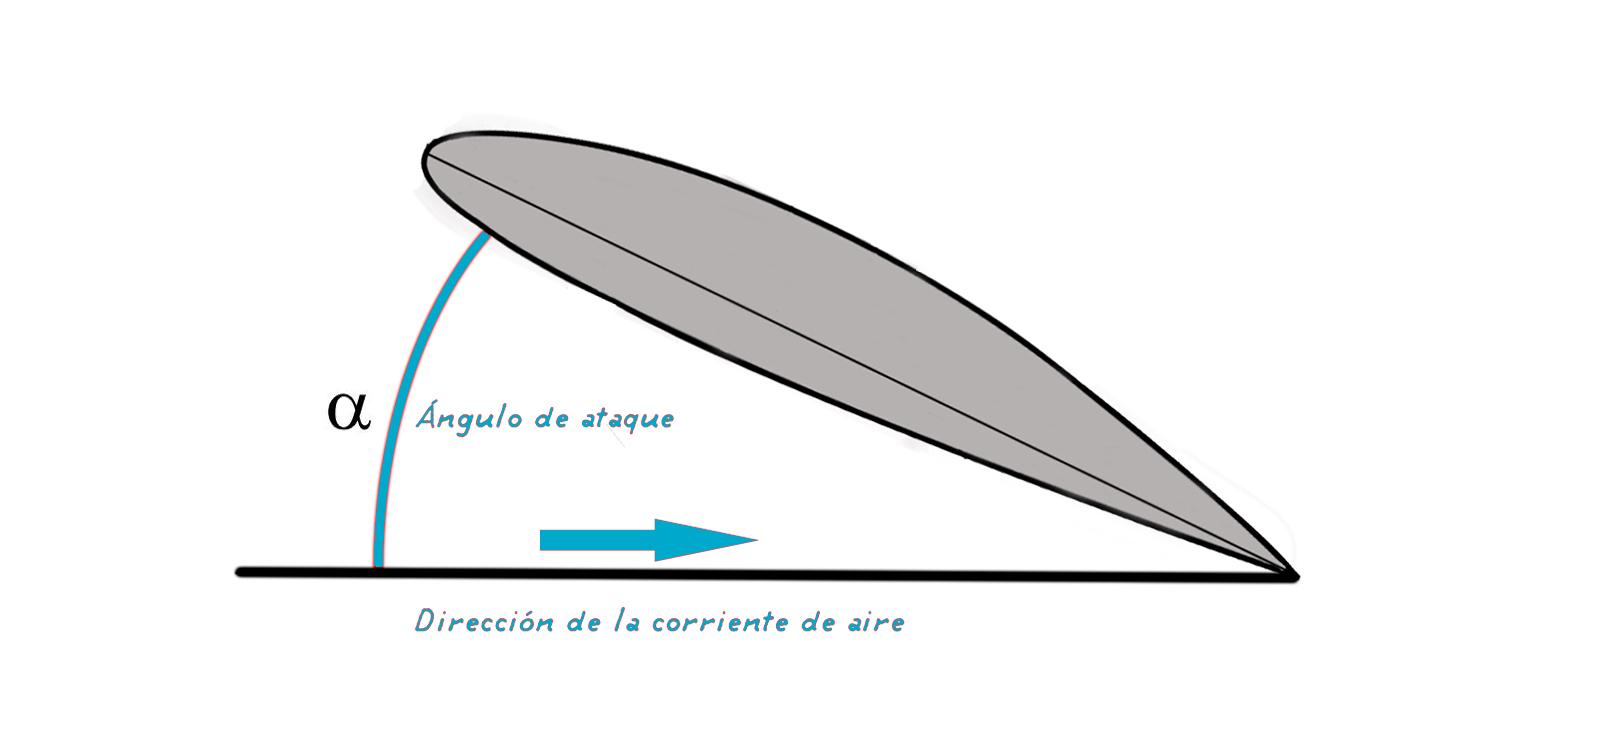 angulo-de-ataque-dron